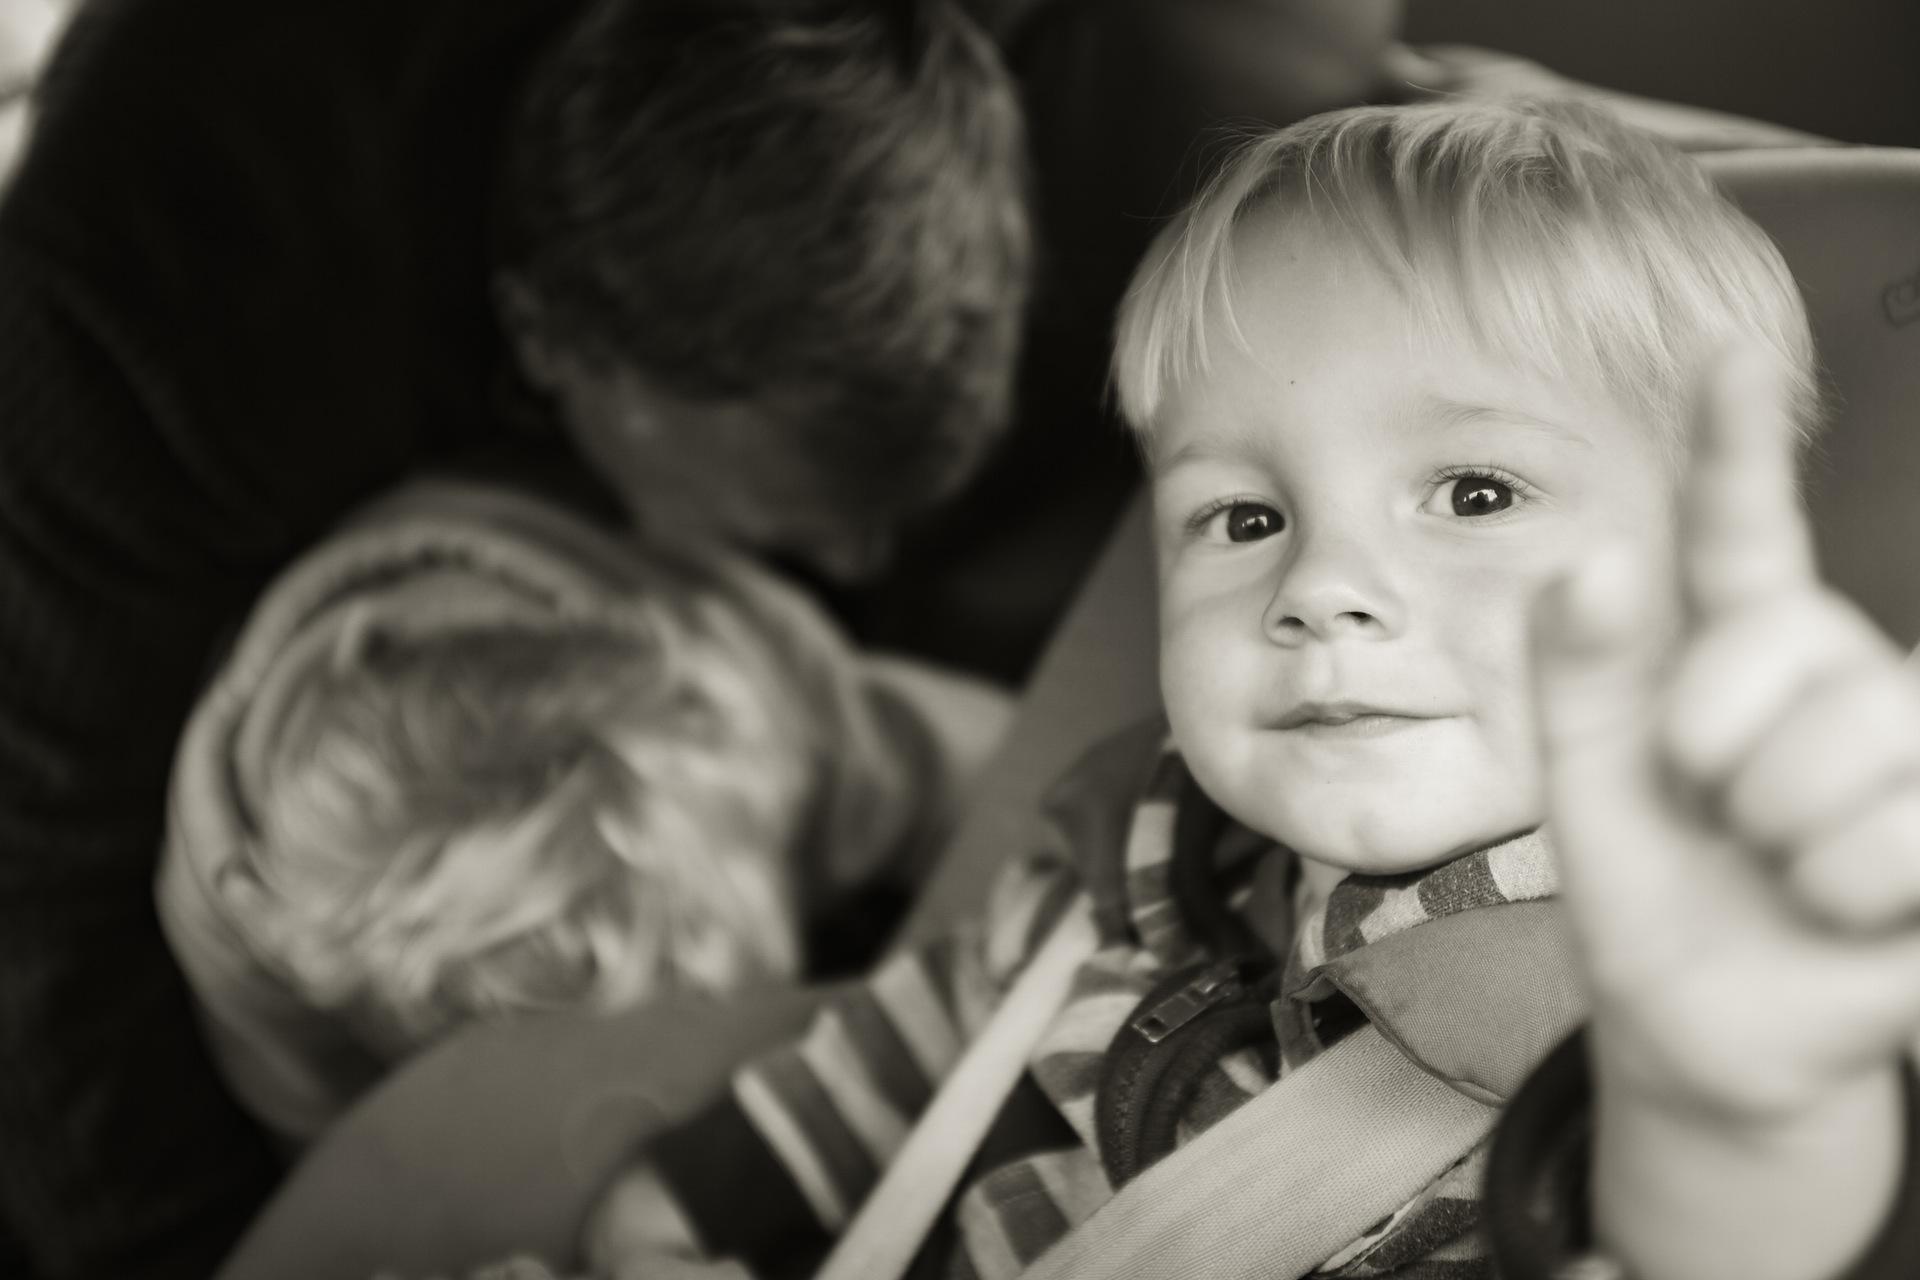 parenting-report-card-cute-child-Americas-Family-Coaches-radio-audio-podcast